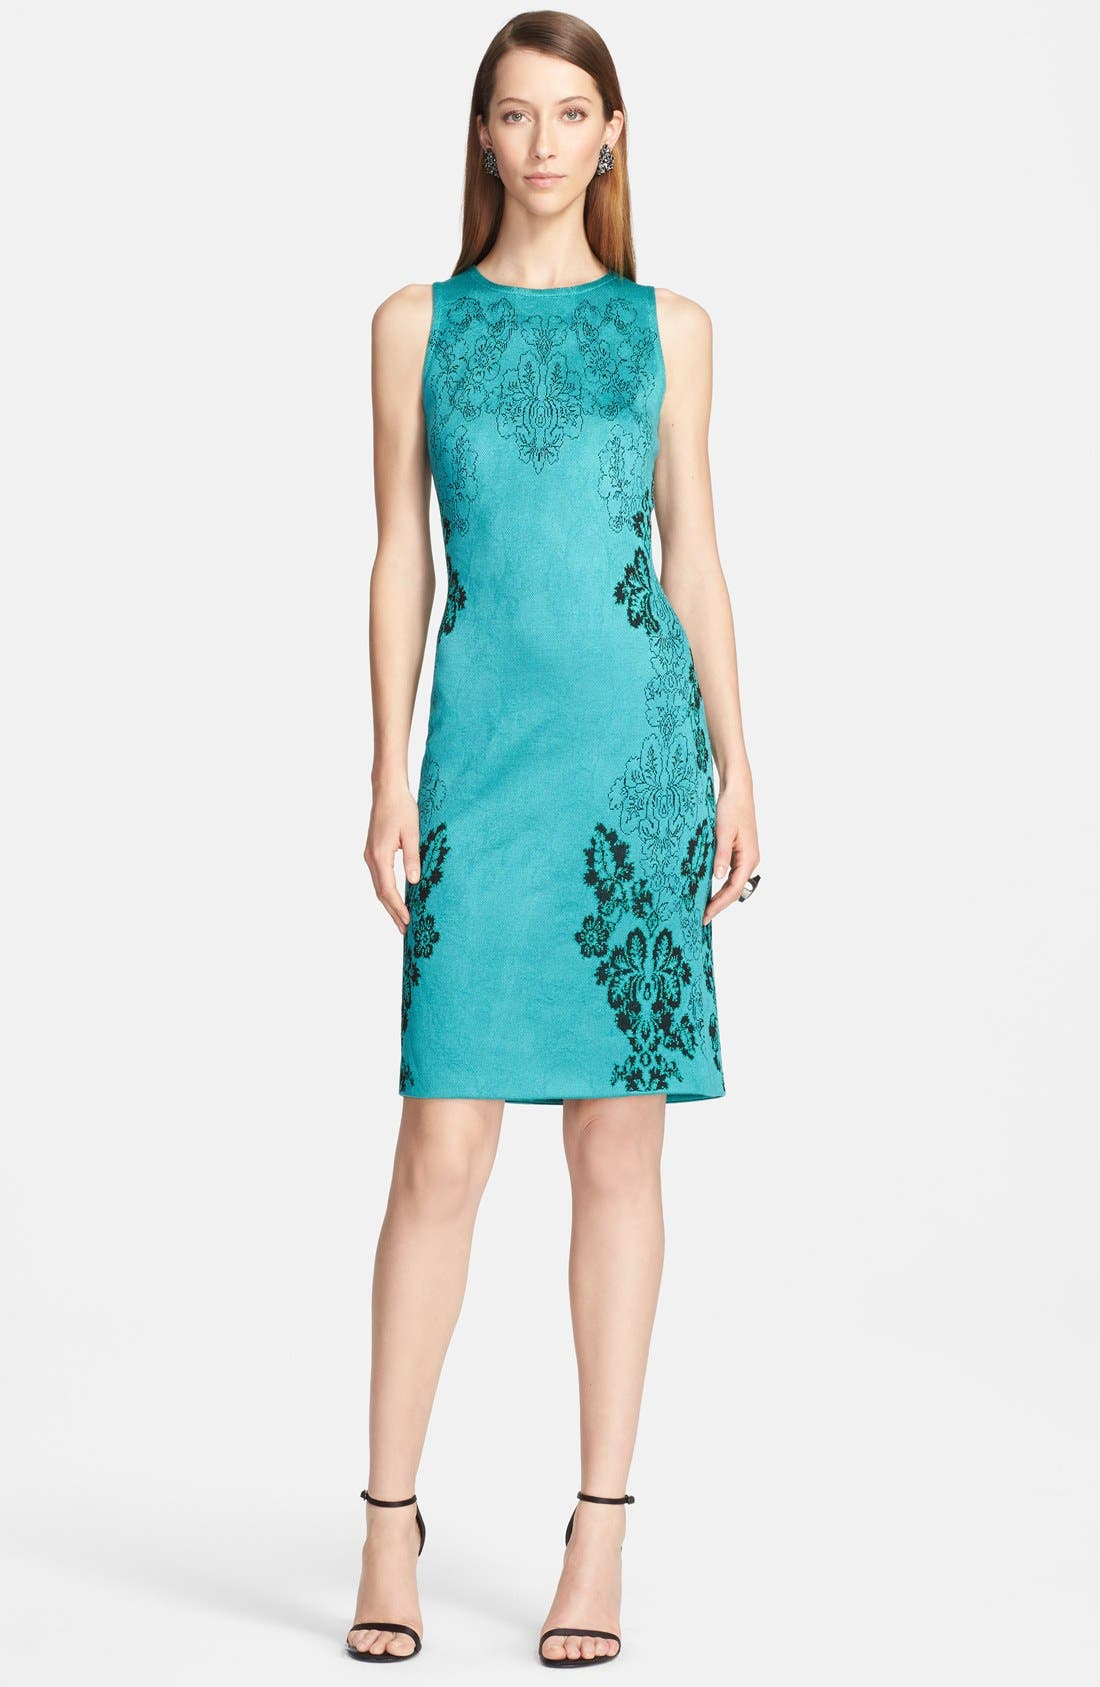 Main Image - St. John Collection 'Floral Cascade' Jacquard Knit Sheath Dress